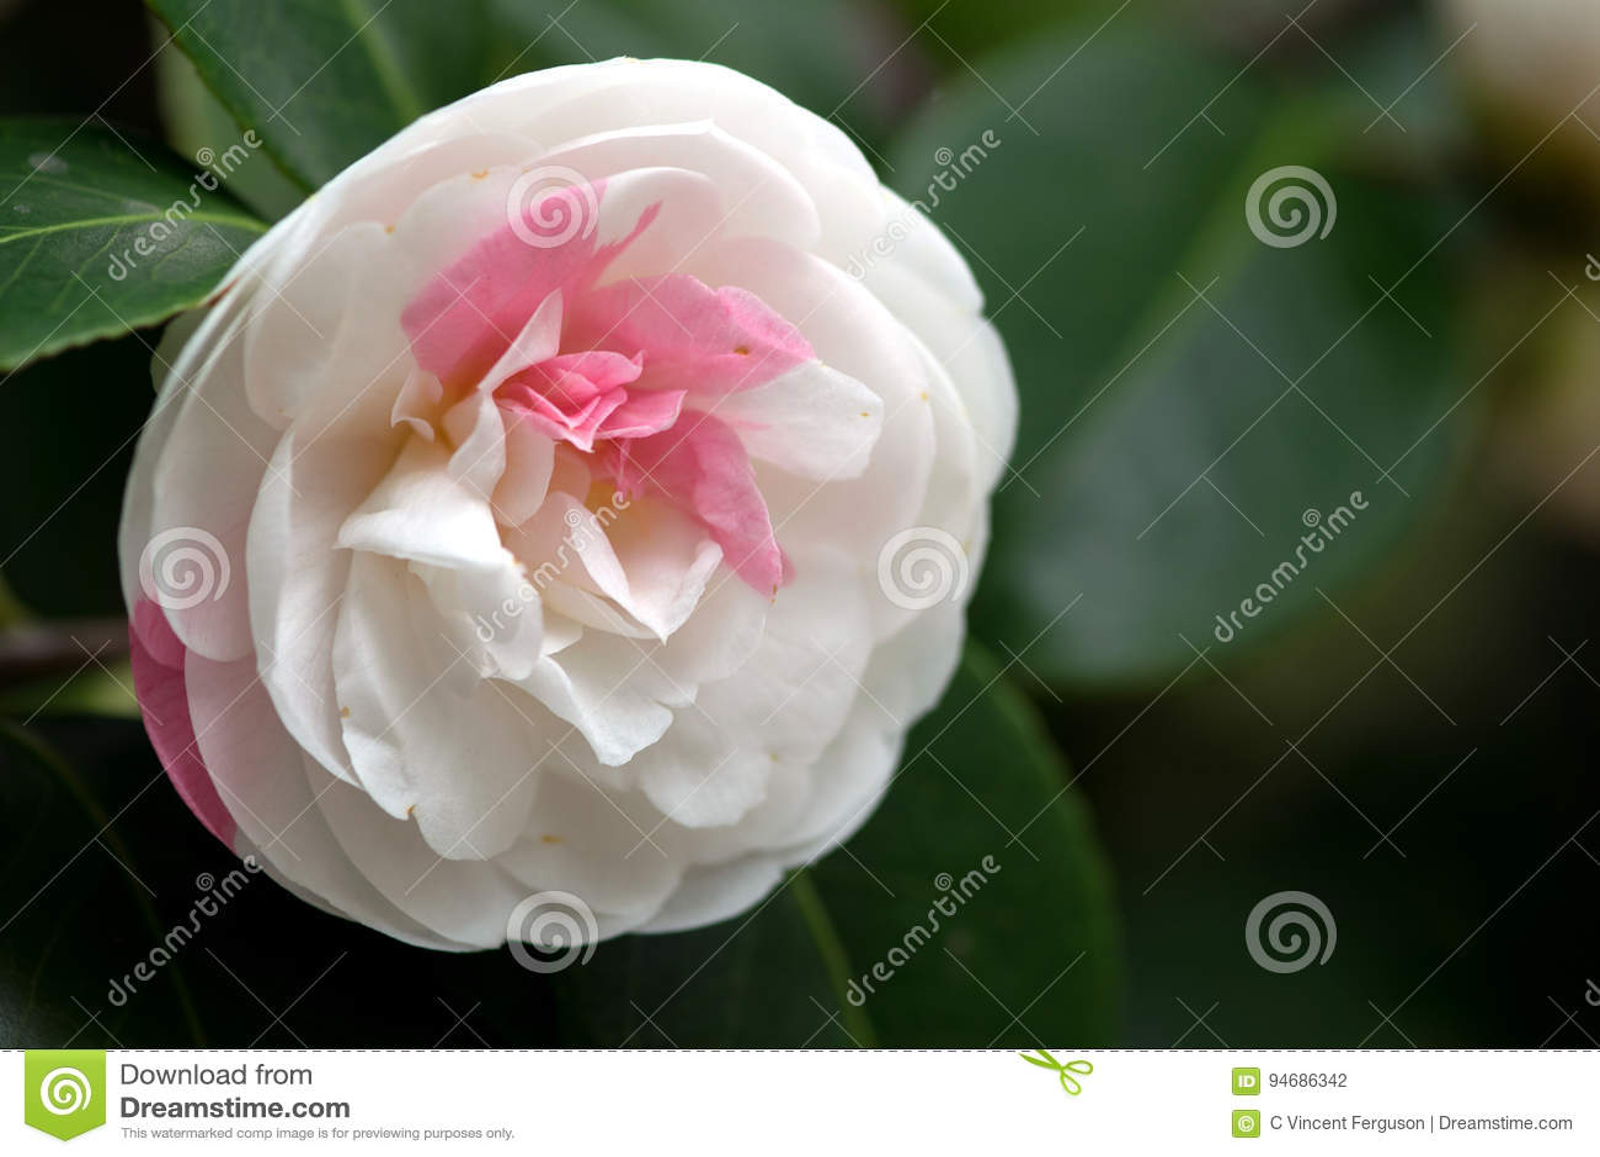 White camellia flower stock photo image of pink white 94686342 white camellia flower mightylinksfo